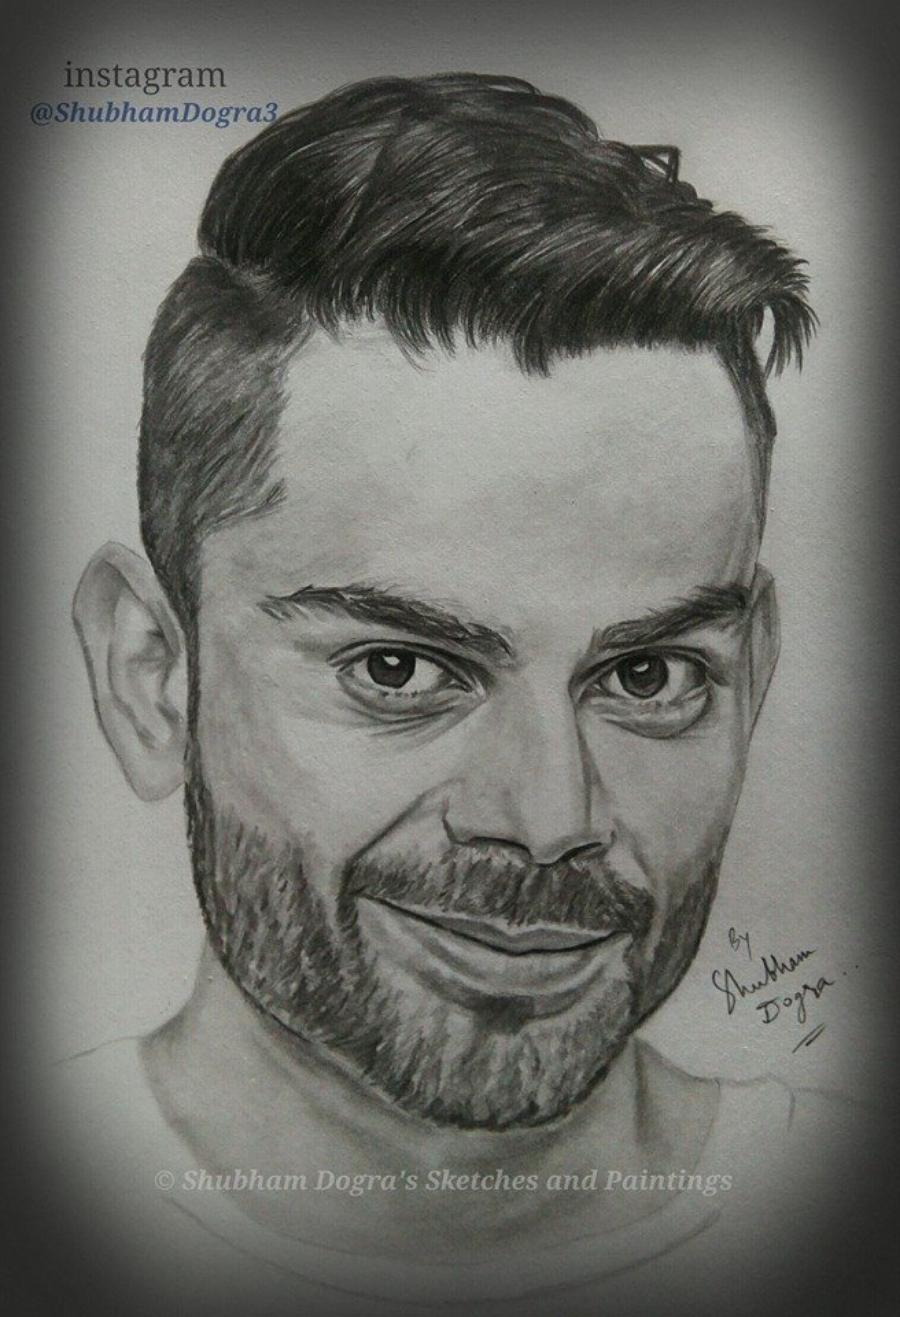 Pencil sketch of virat kohli